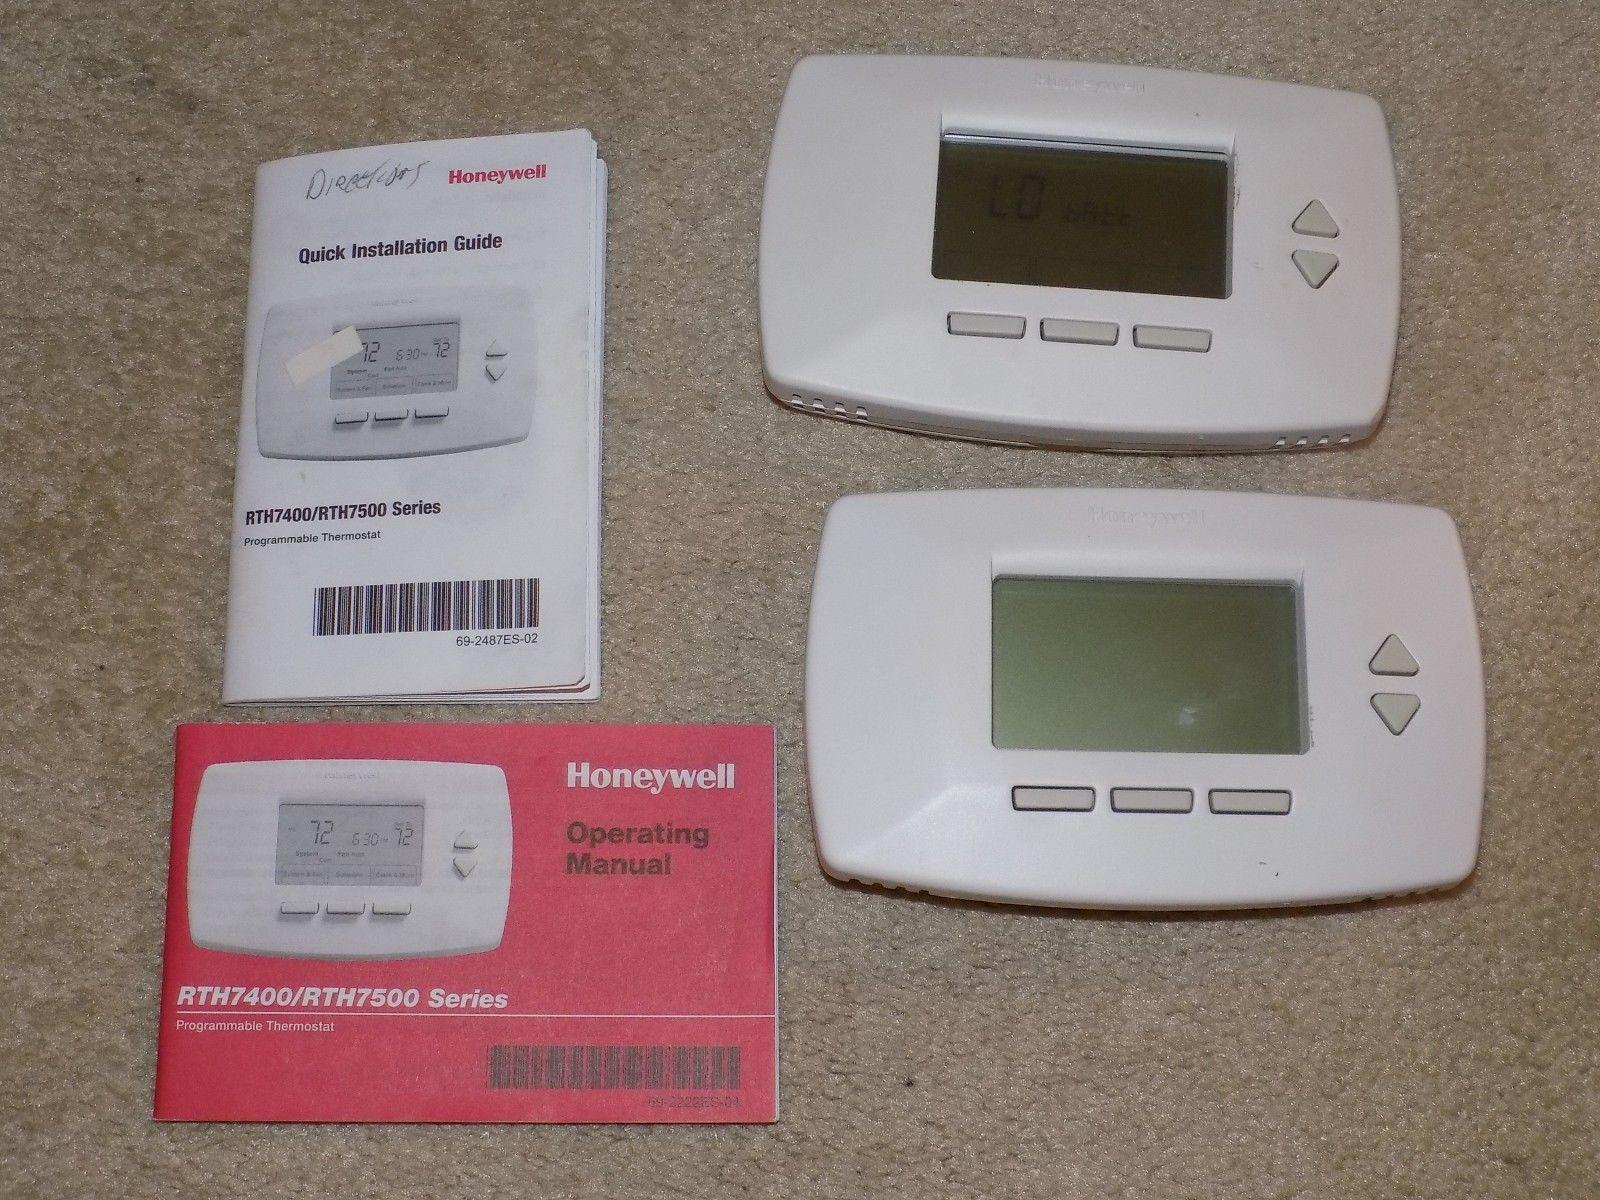 lot of 2 honeywell rth7400 rth7500 7 day and 50 similar items rh bonanza com Honeywell Alarm Keypad Manual honeywell rth7600 manual